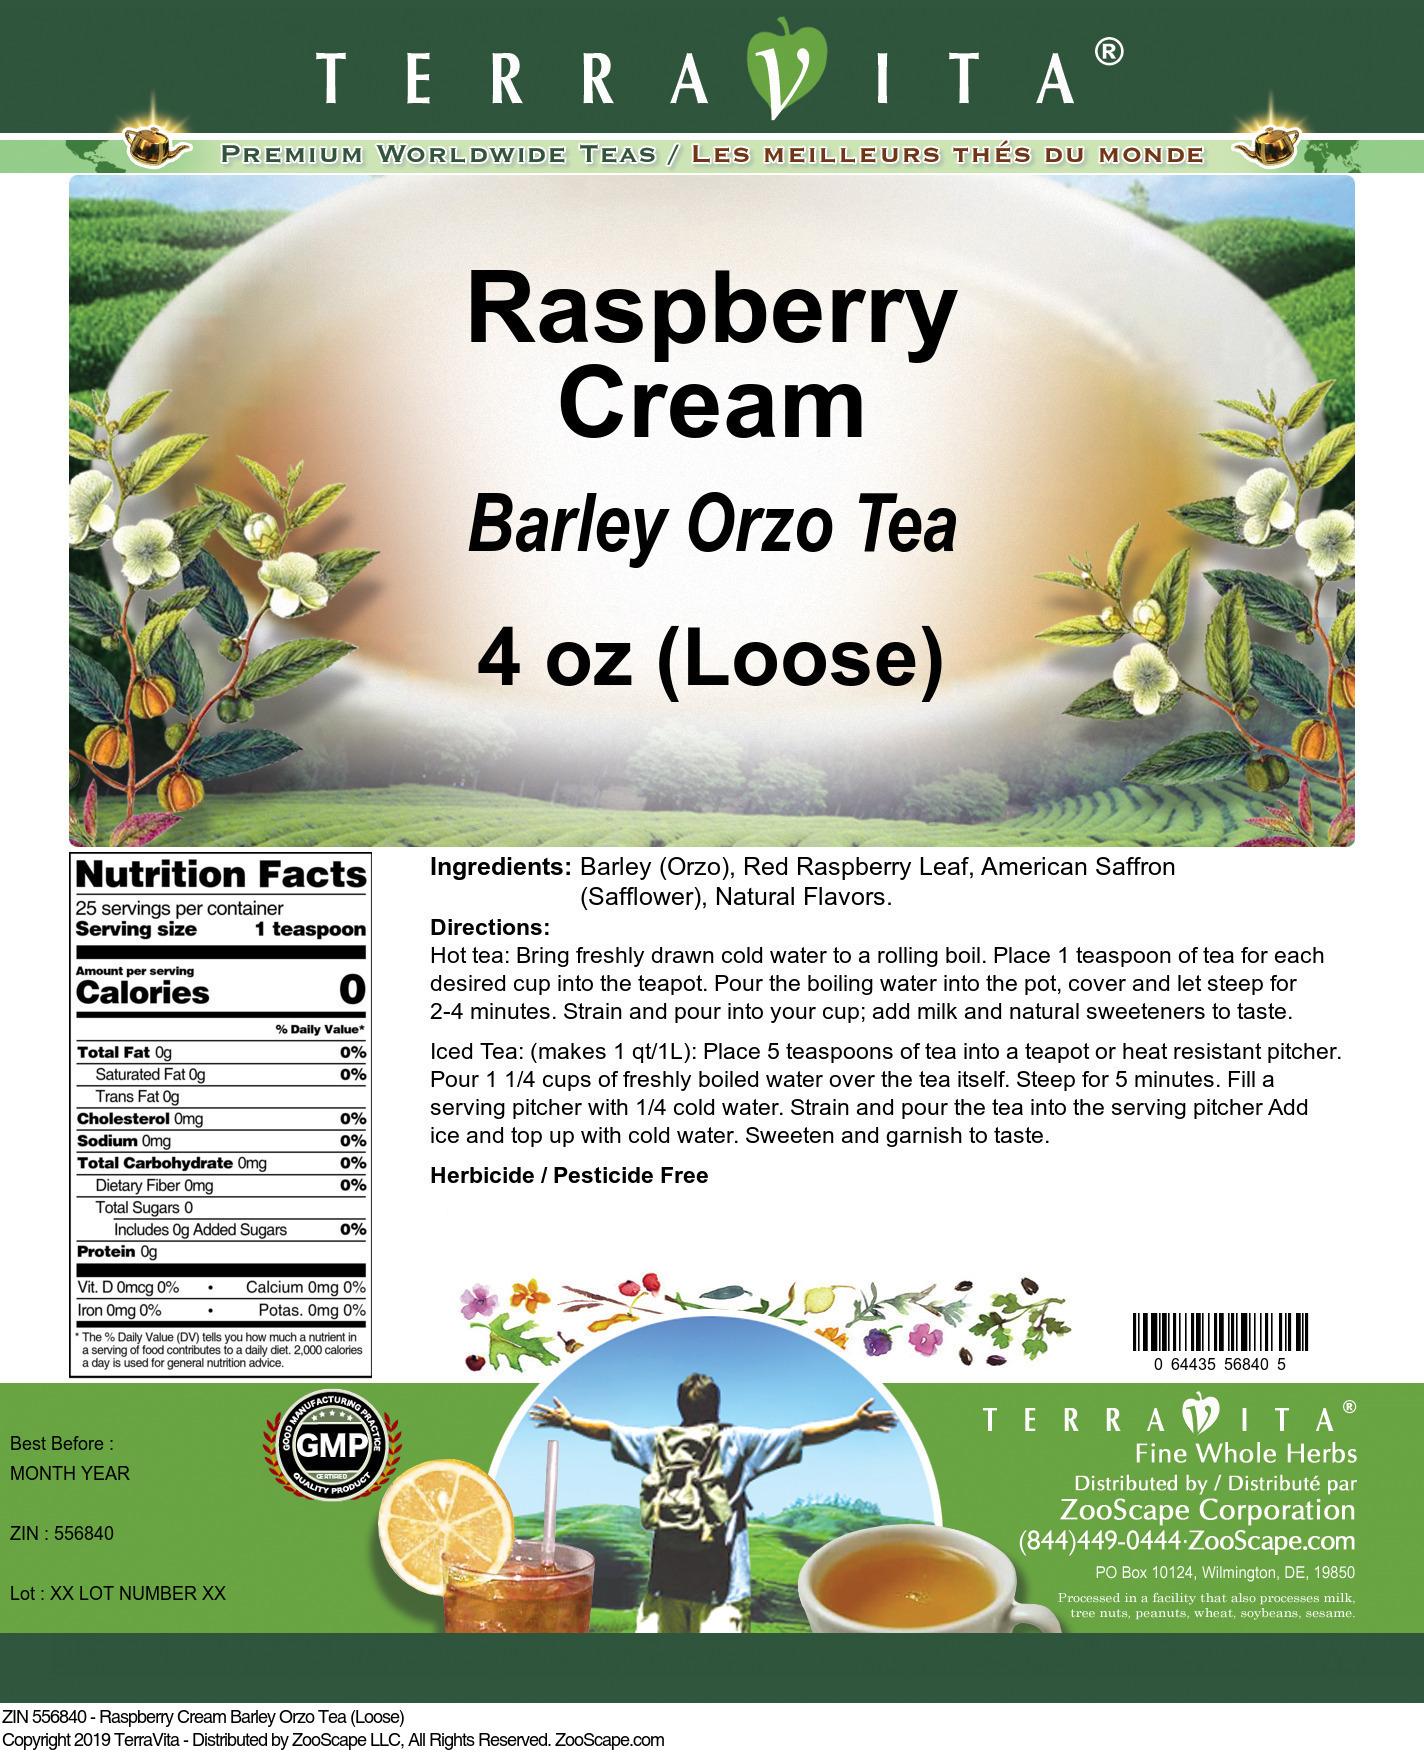 Raspberry Cream Barley Orzo